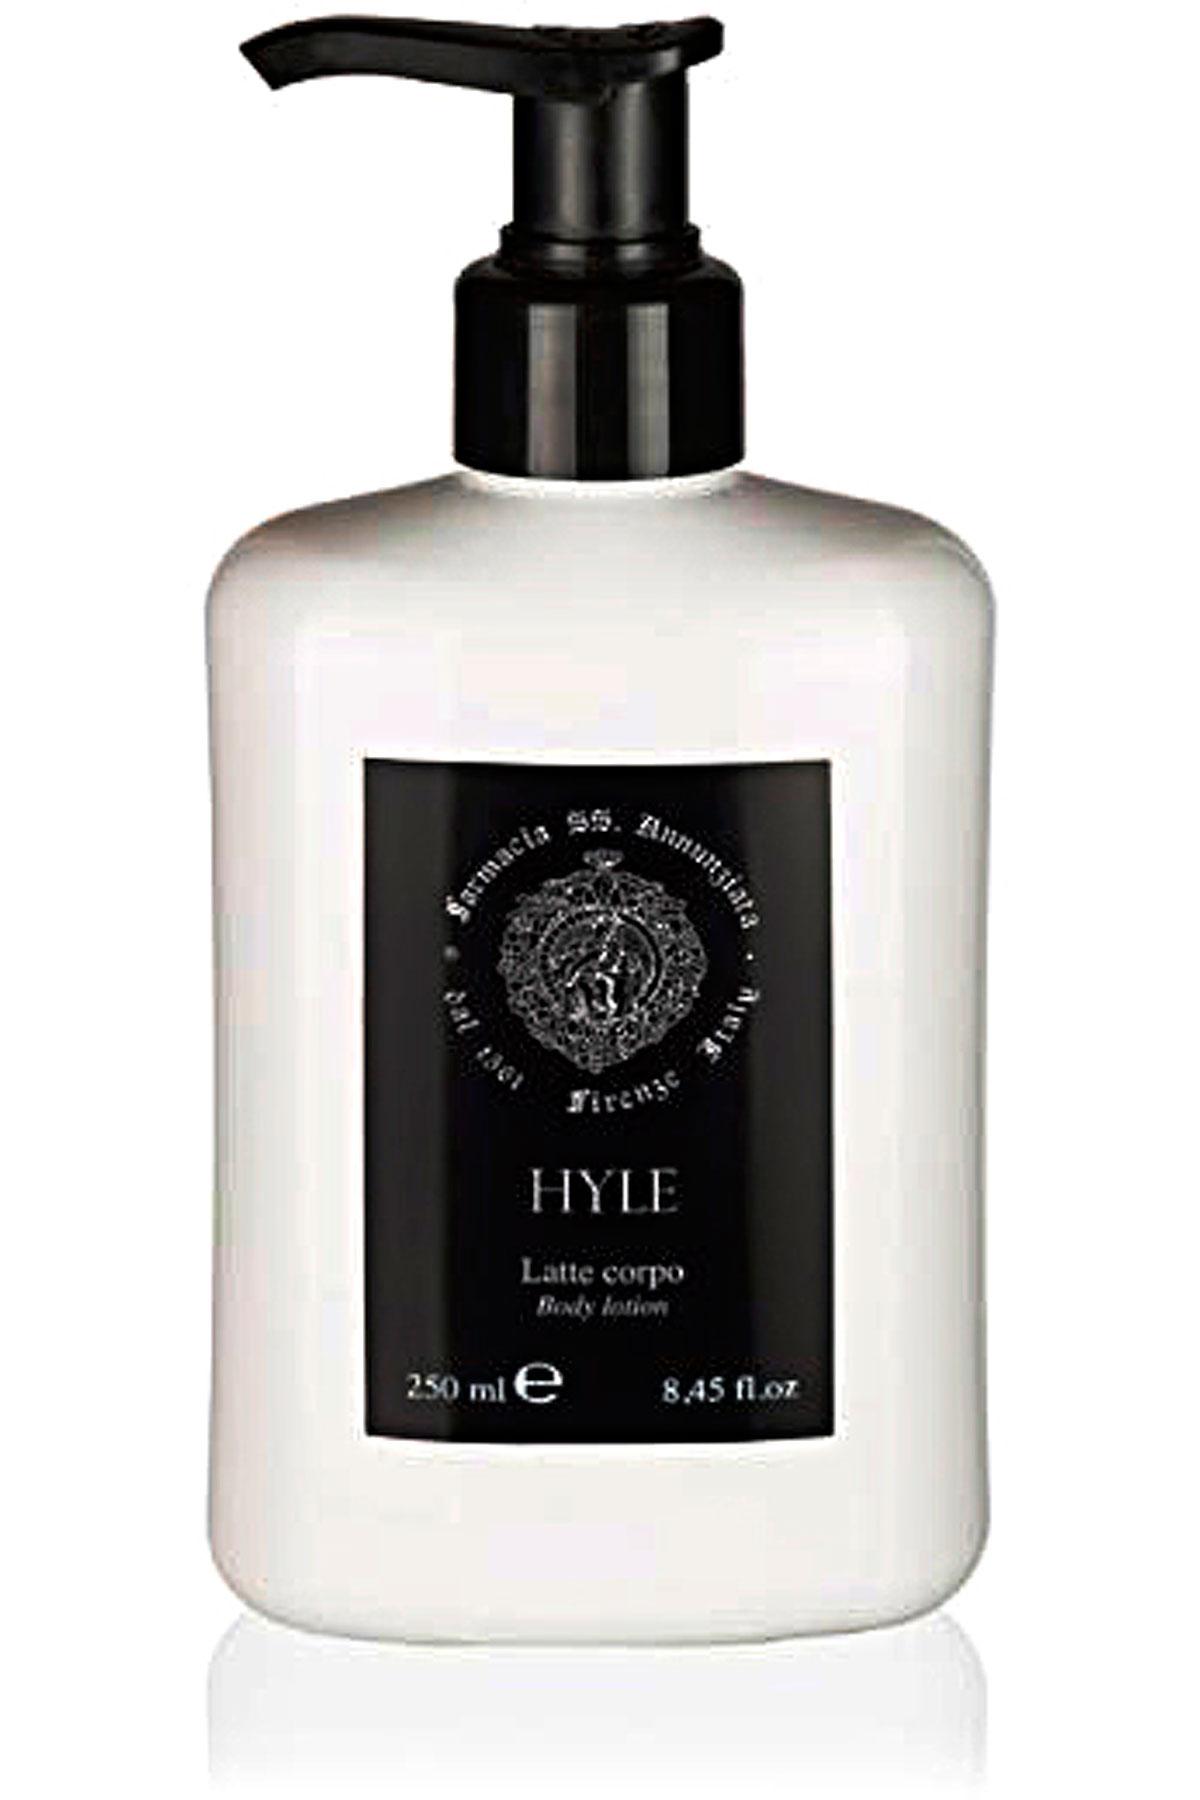 Farmacia Ss Annunziata 1561 Beauty for Men On Sale, Hyle - Body Milk - 250 Ml, 2019, 250 ml